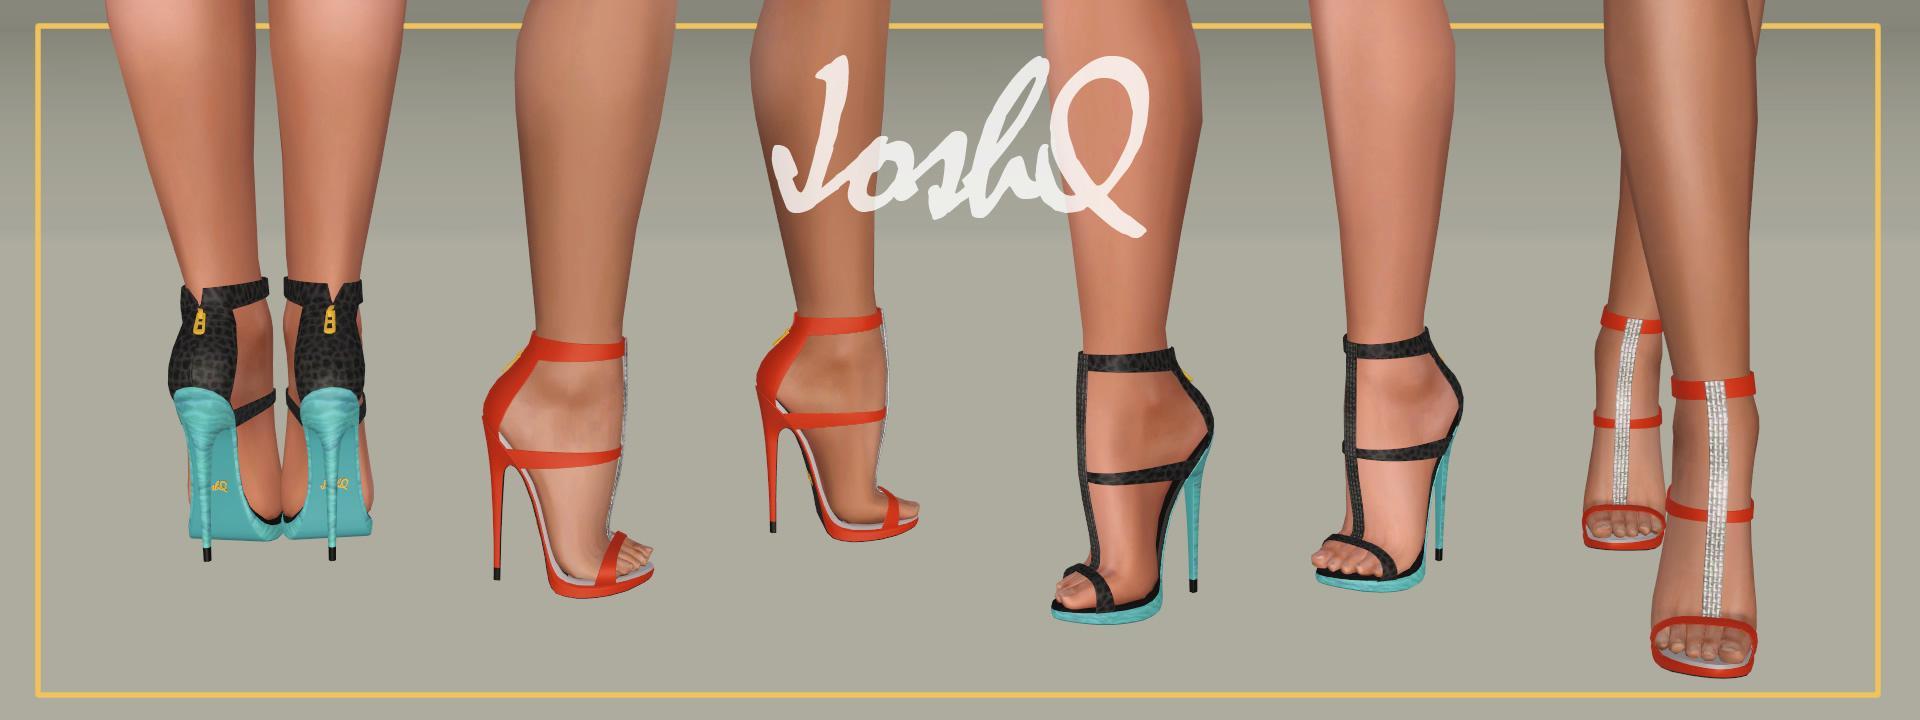 Impossible Heels 'Saskia'